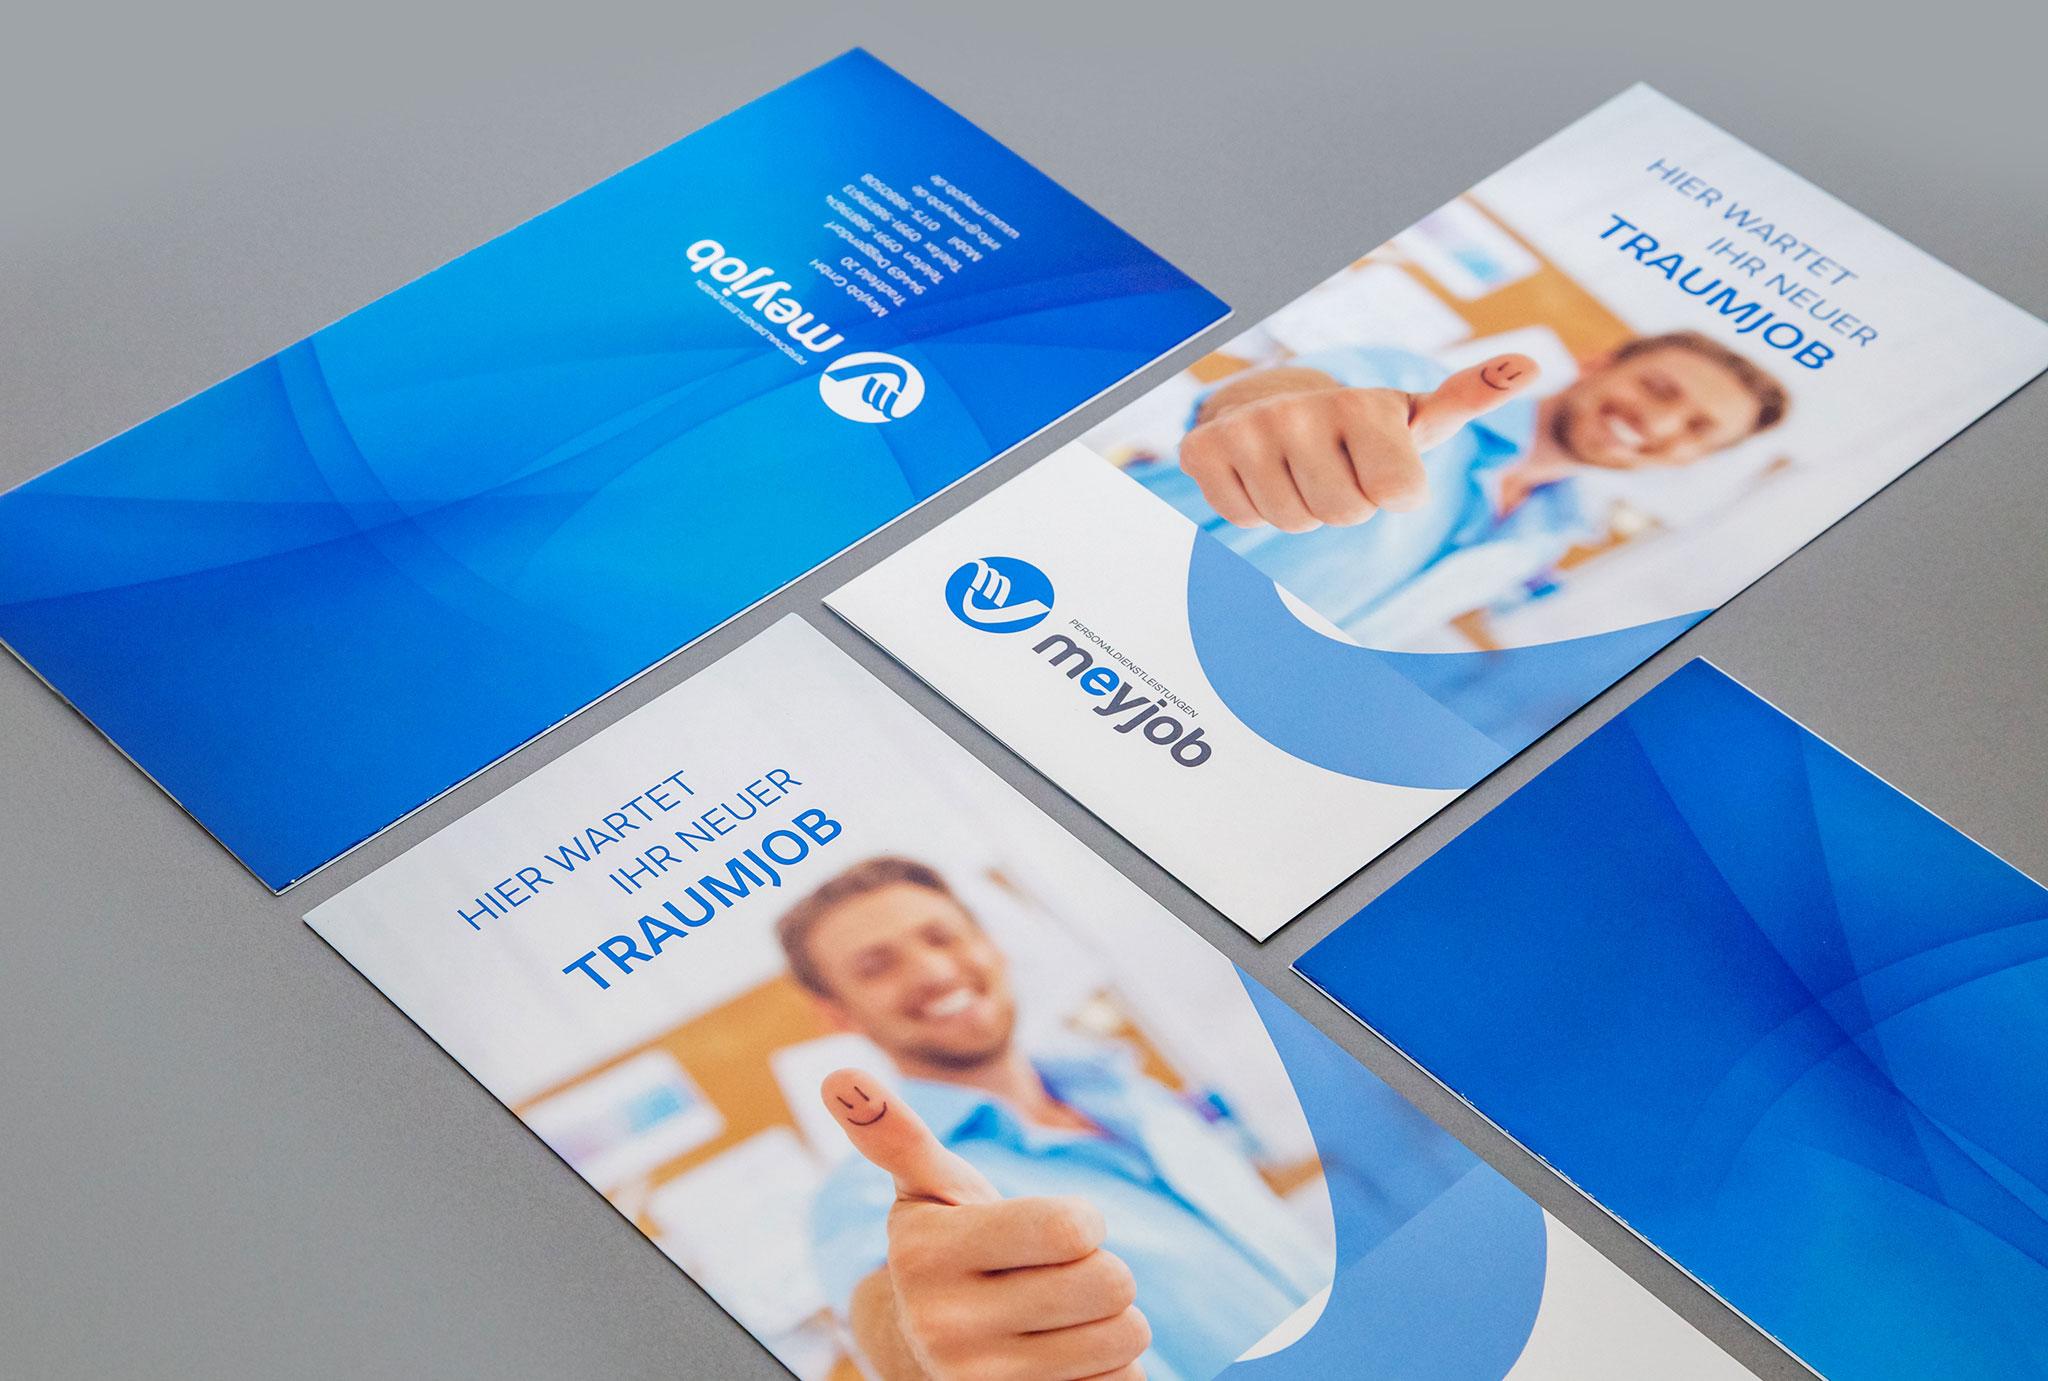 MeyJob Flyer | Werbeagentur Roland C. Ritter